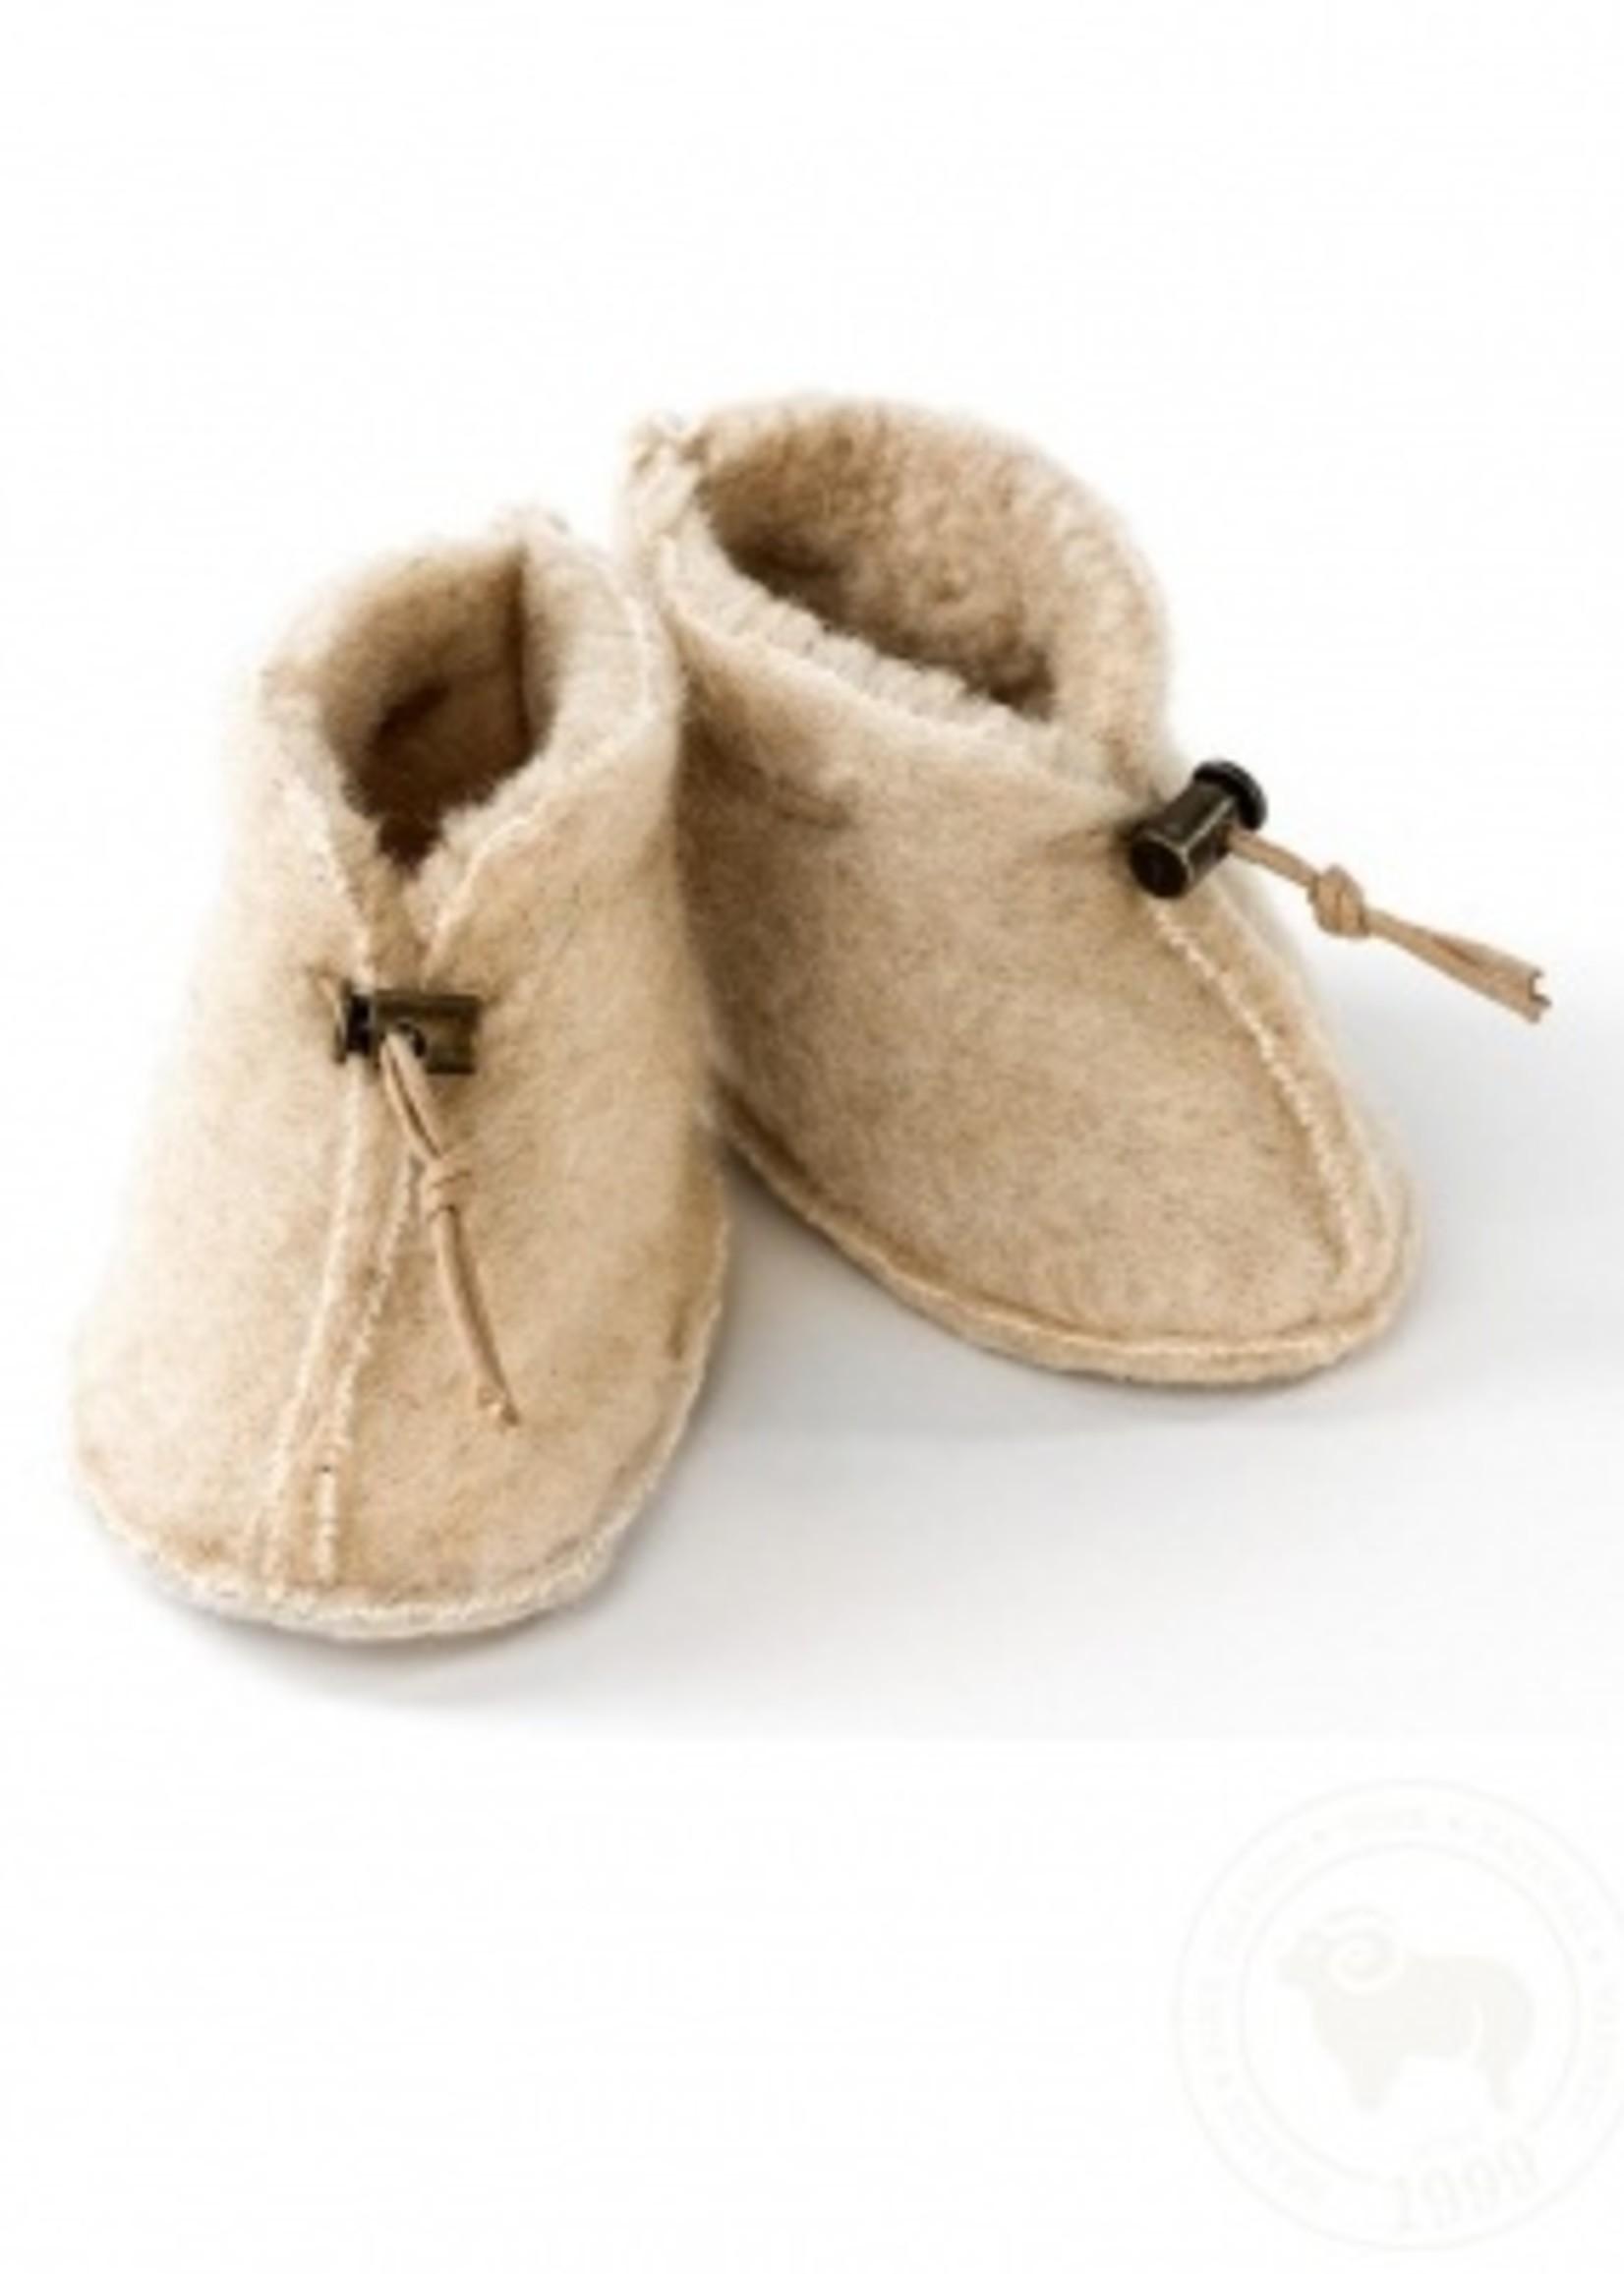 Alwero Slippers 100% emowool - Beige